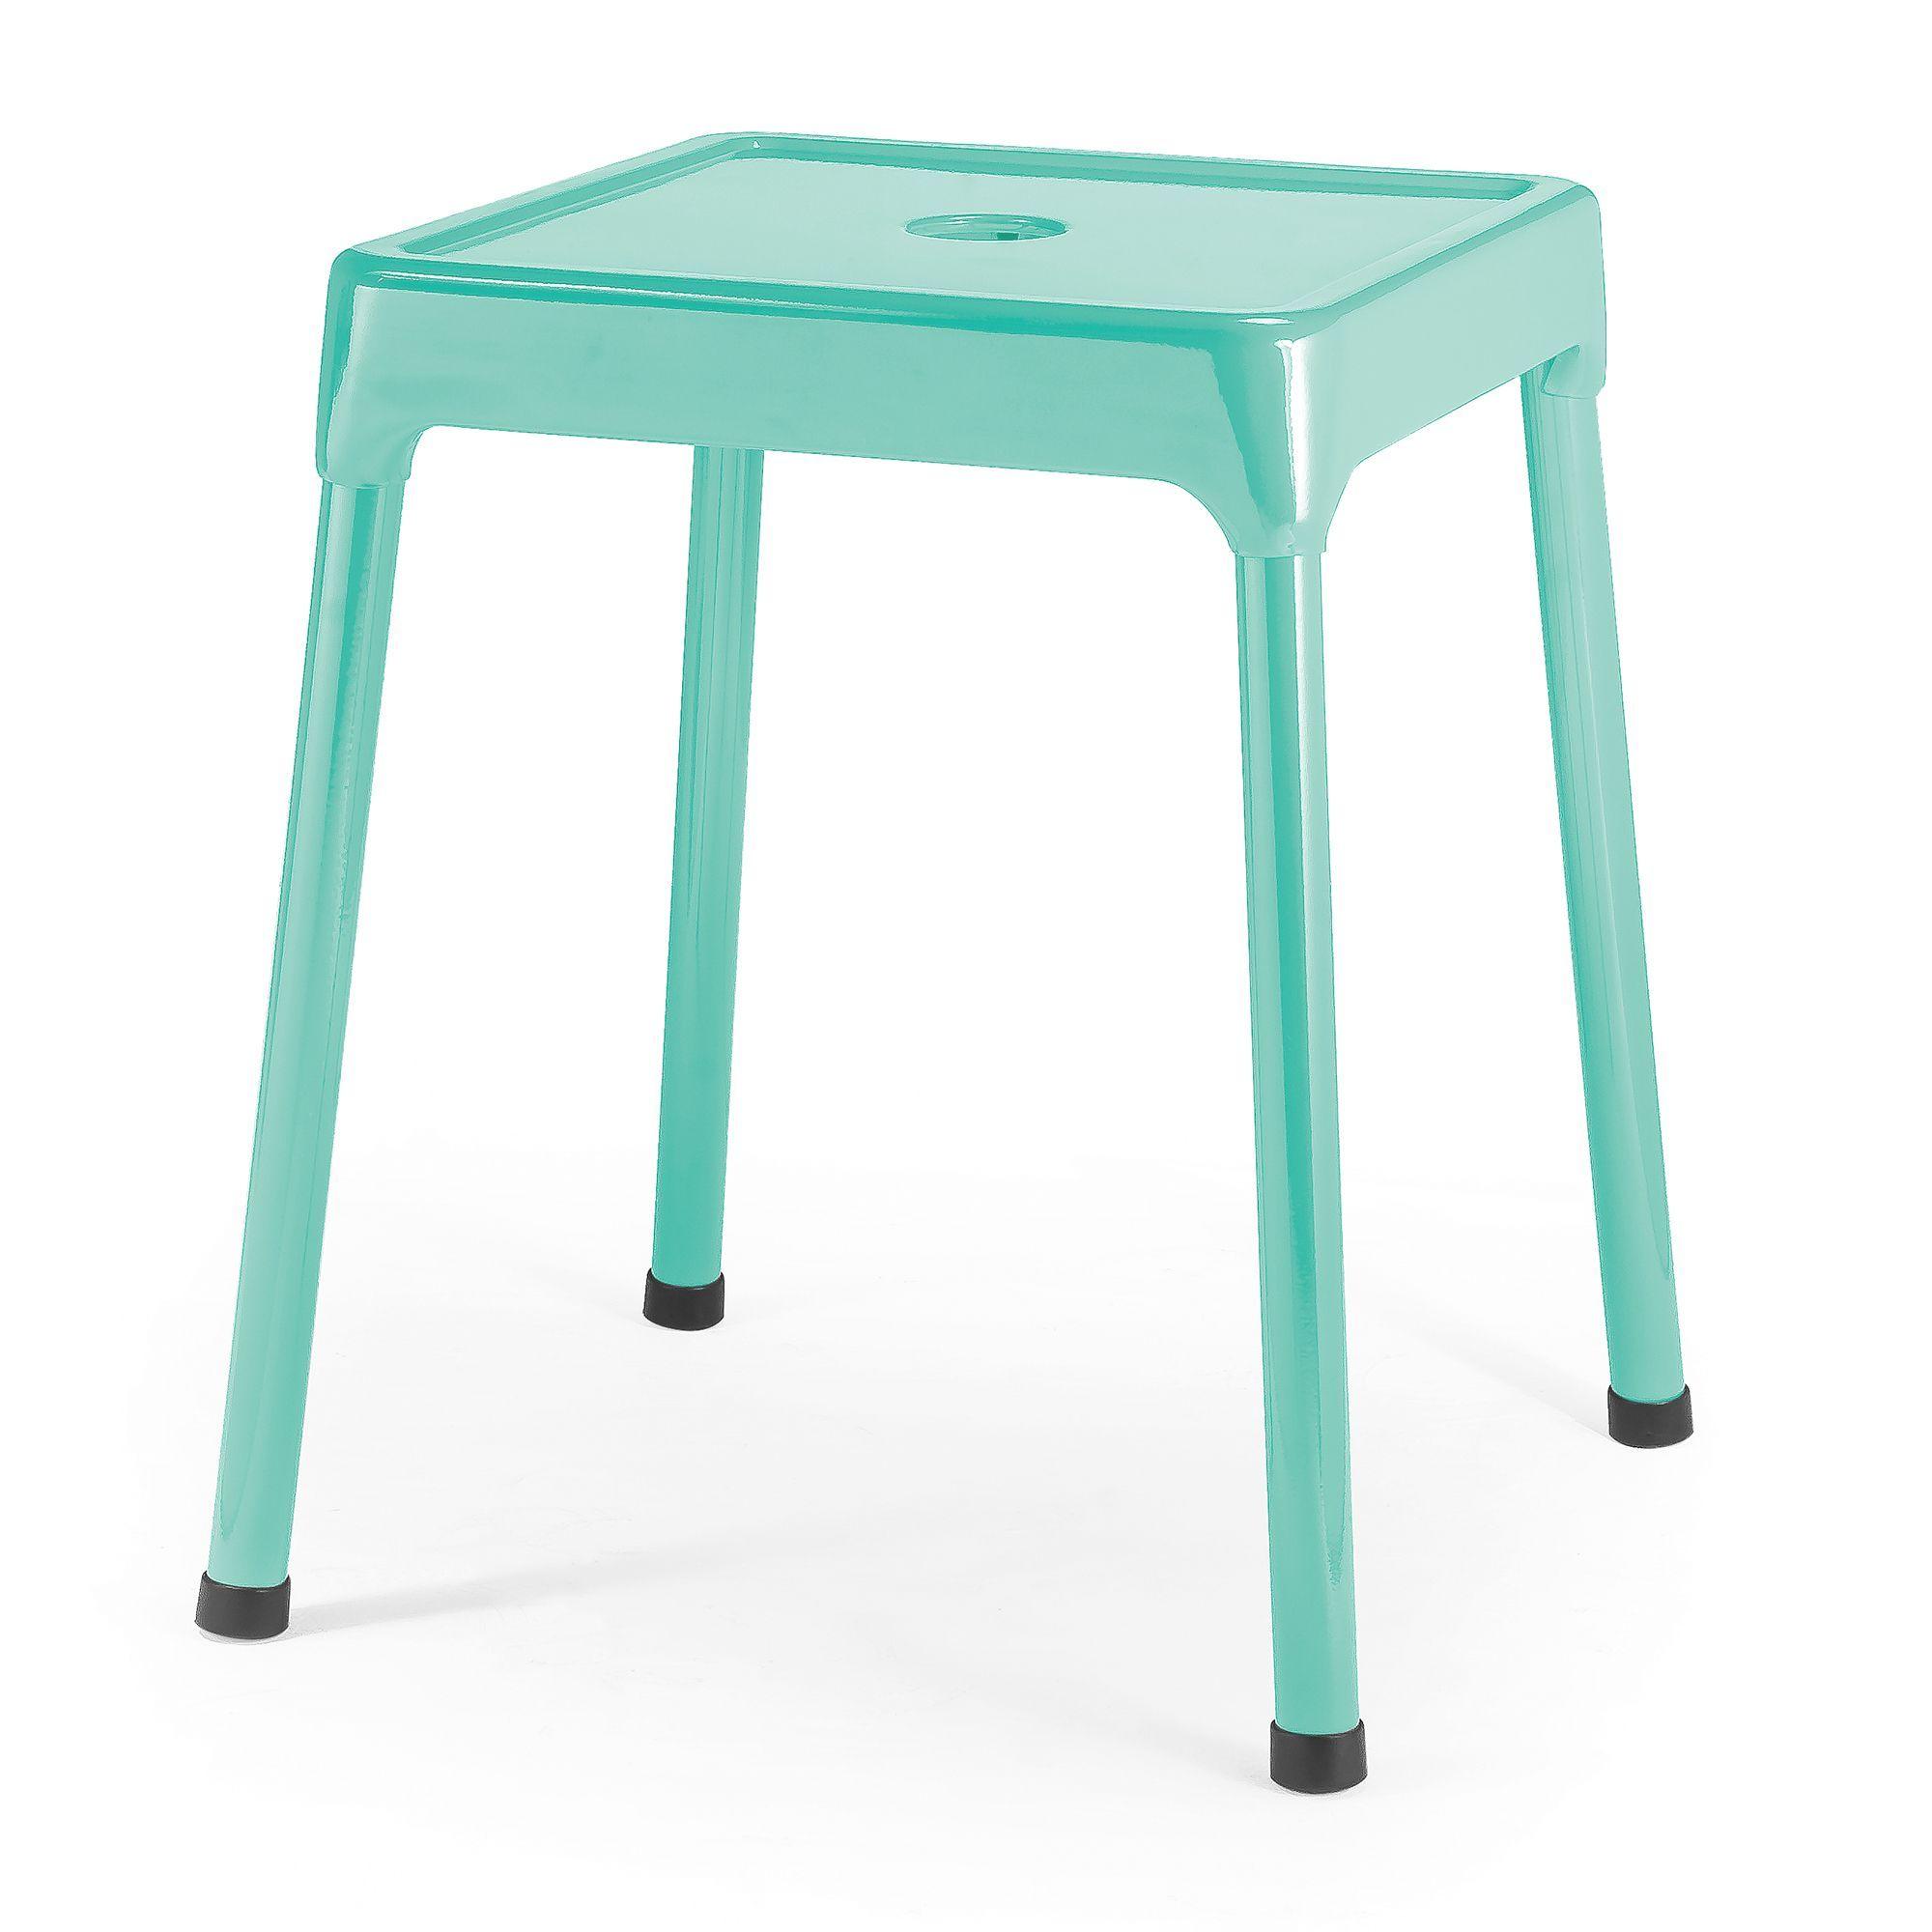 tabouret en acier vert d 39 eau mata tabourets et bancs. Black Bedroom Furniture Sets. Home Design Ideas